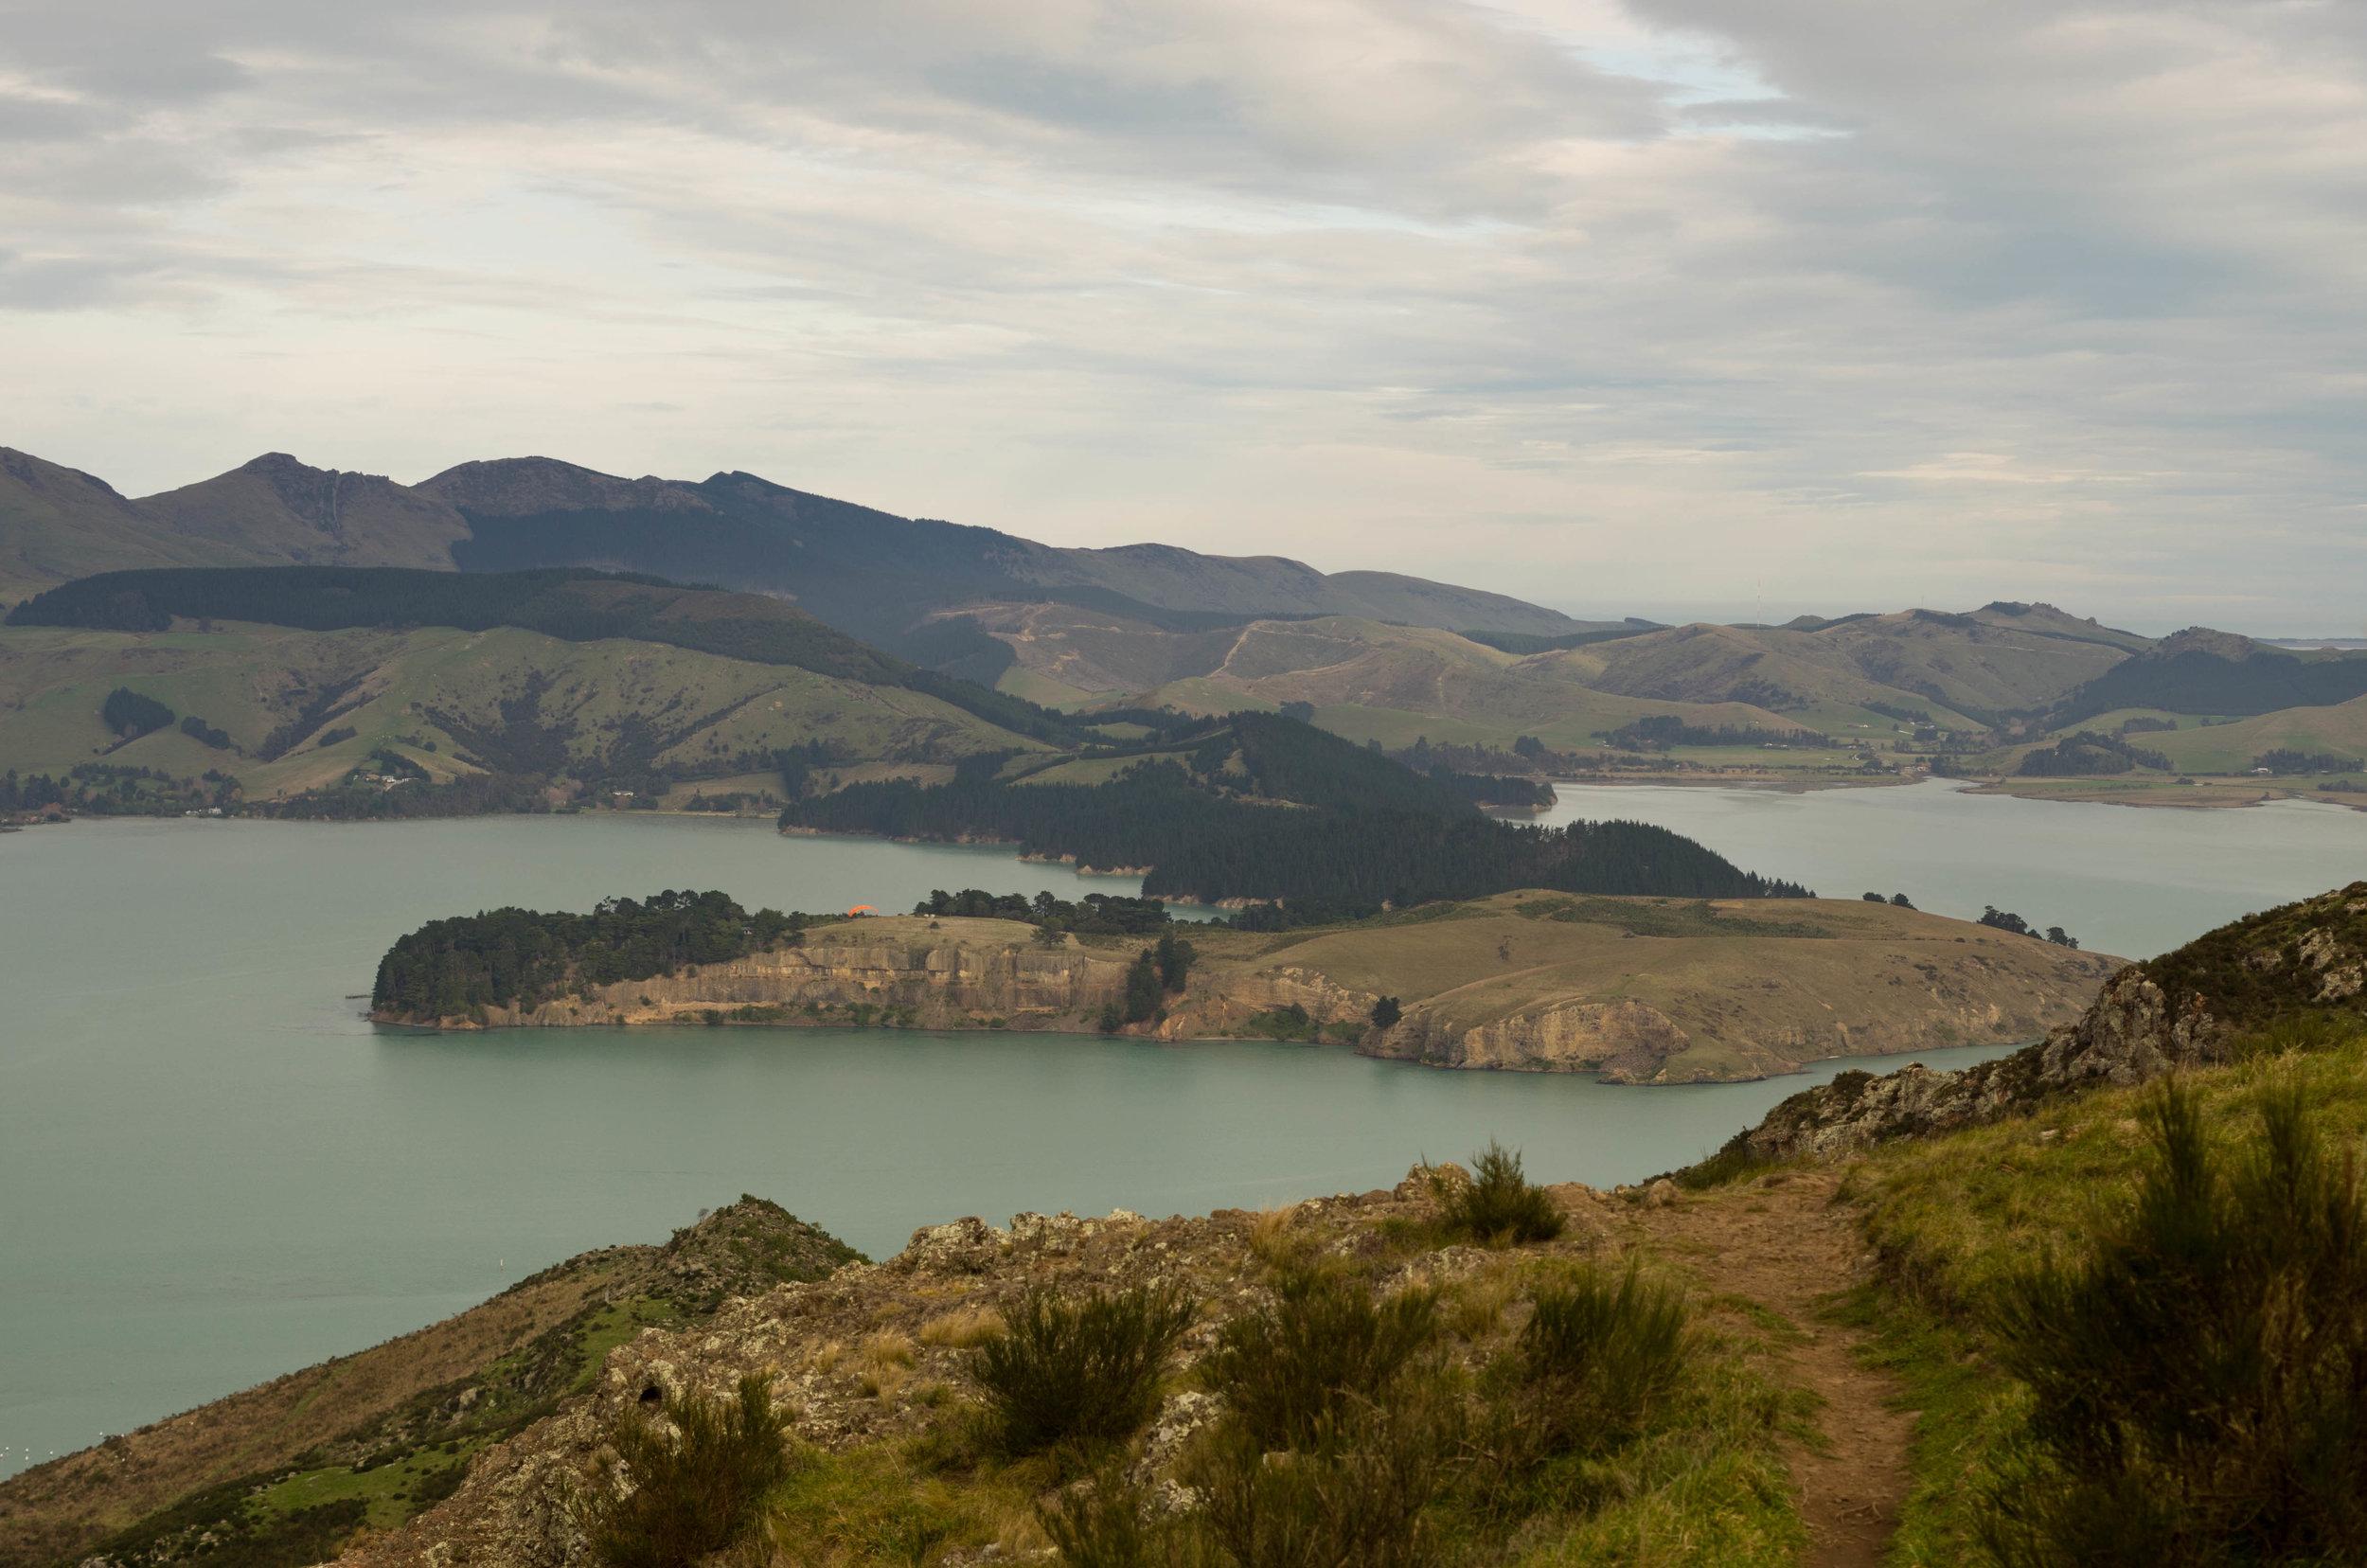 Quail Island and Lyttleton Harbour, New Zealand